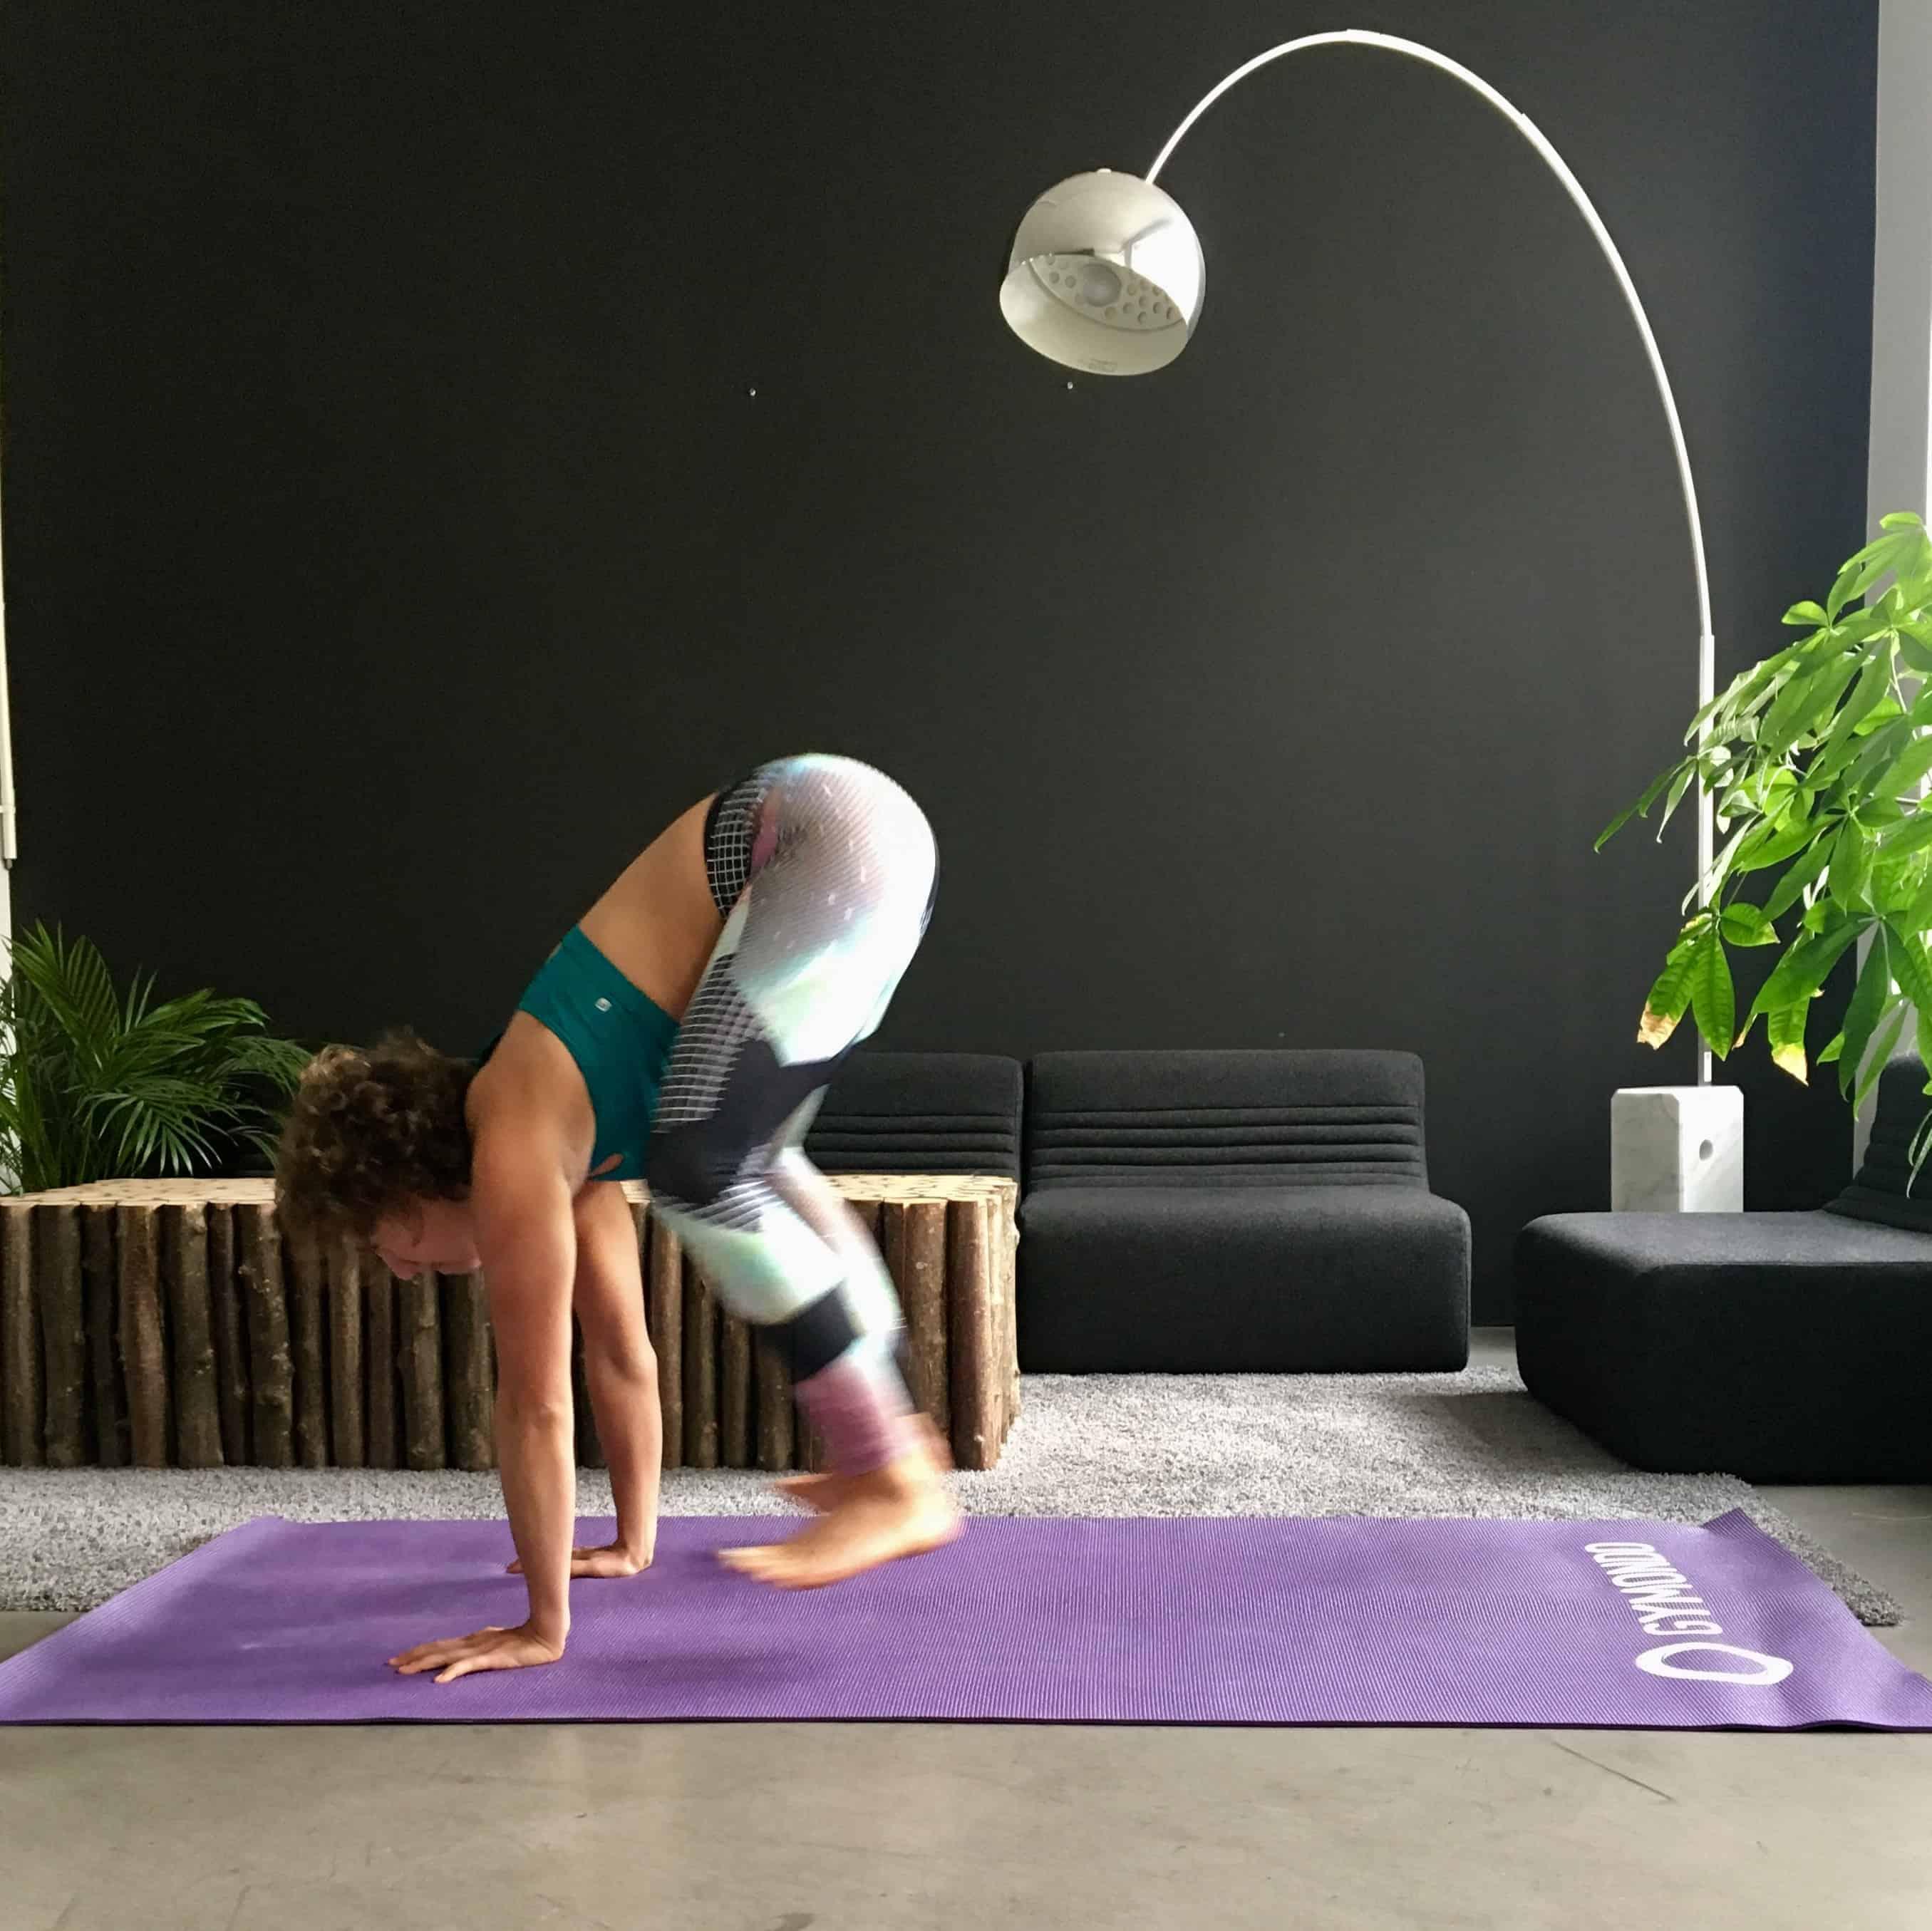 Frau macht Burpee auf lila trainingsmatte